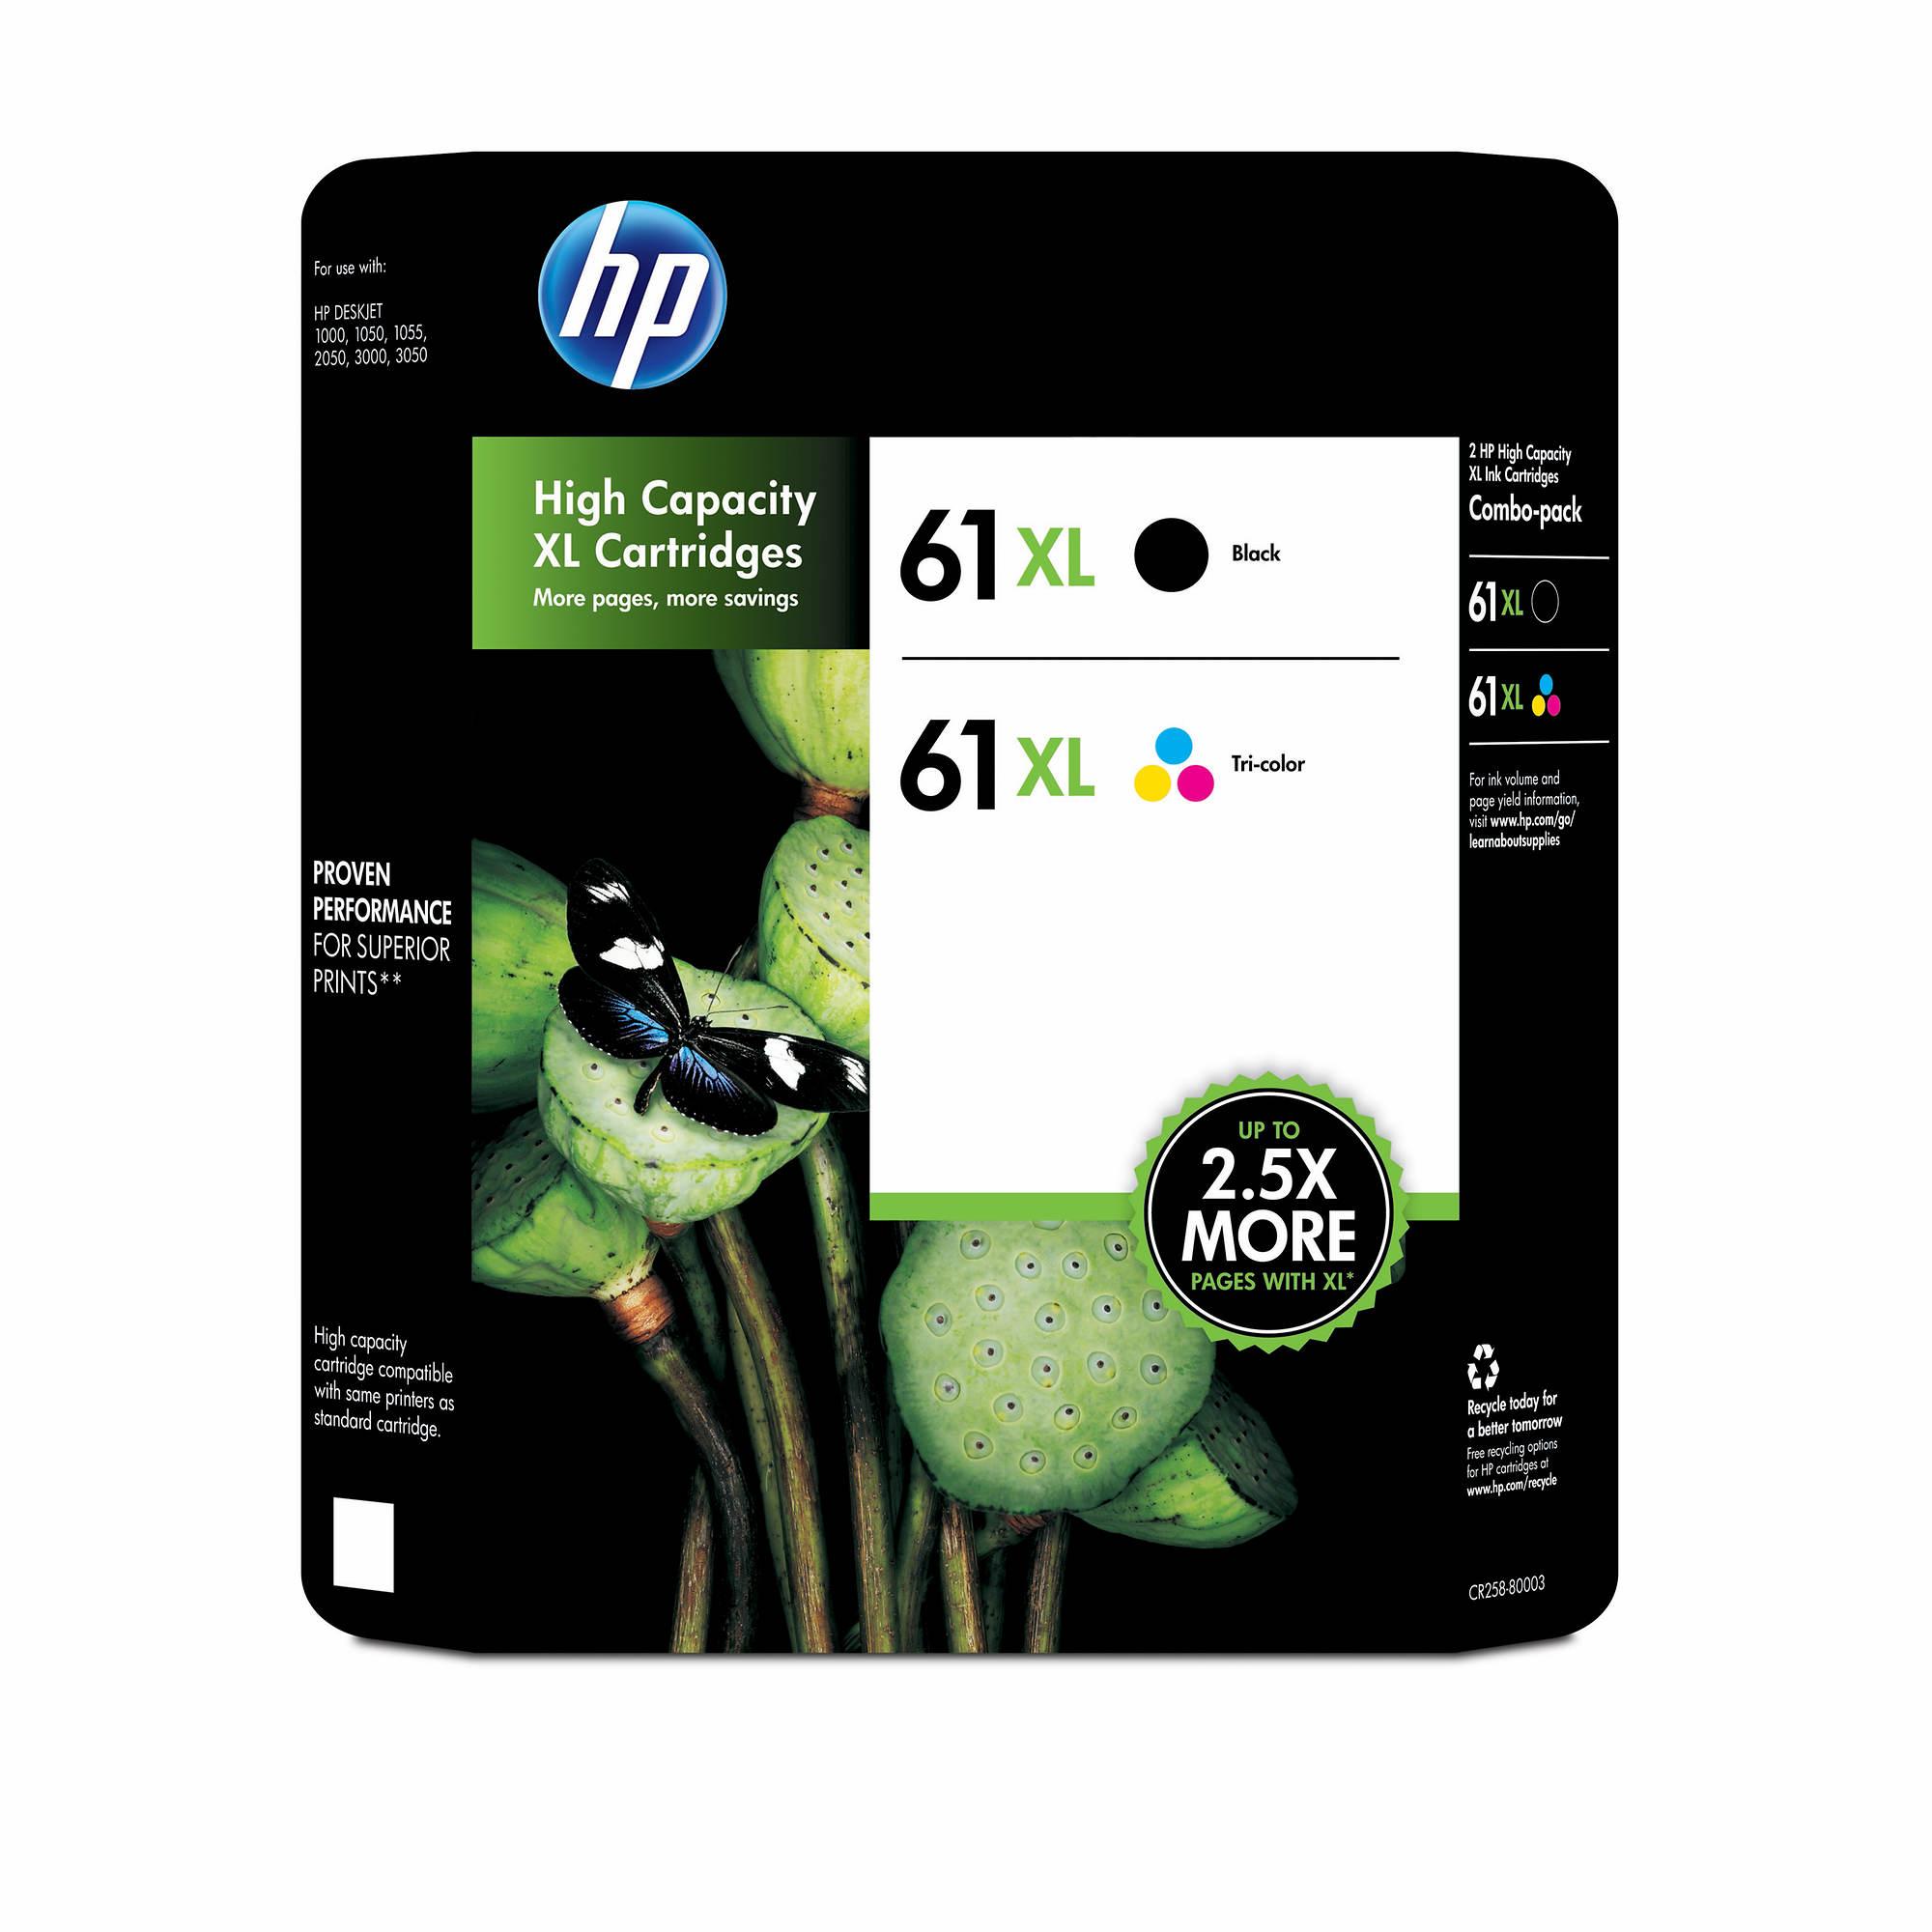 Hp printer ink 61 combo pack - Musiians friend